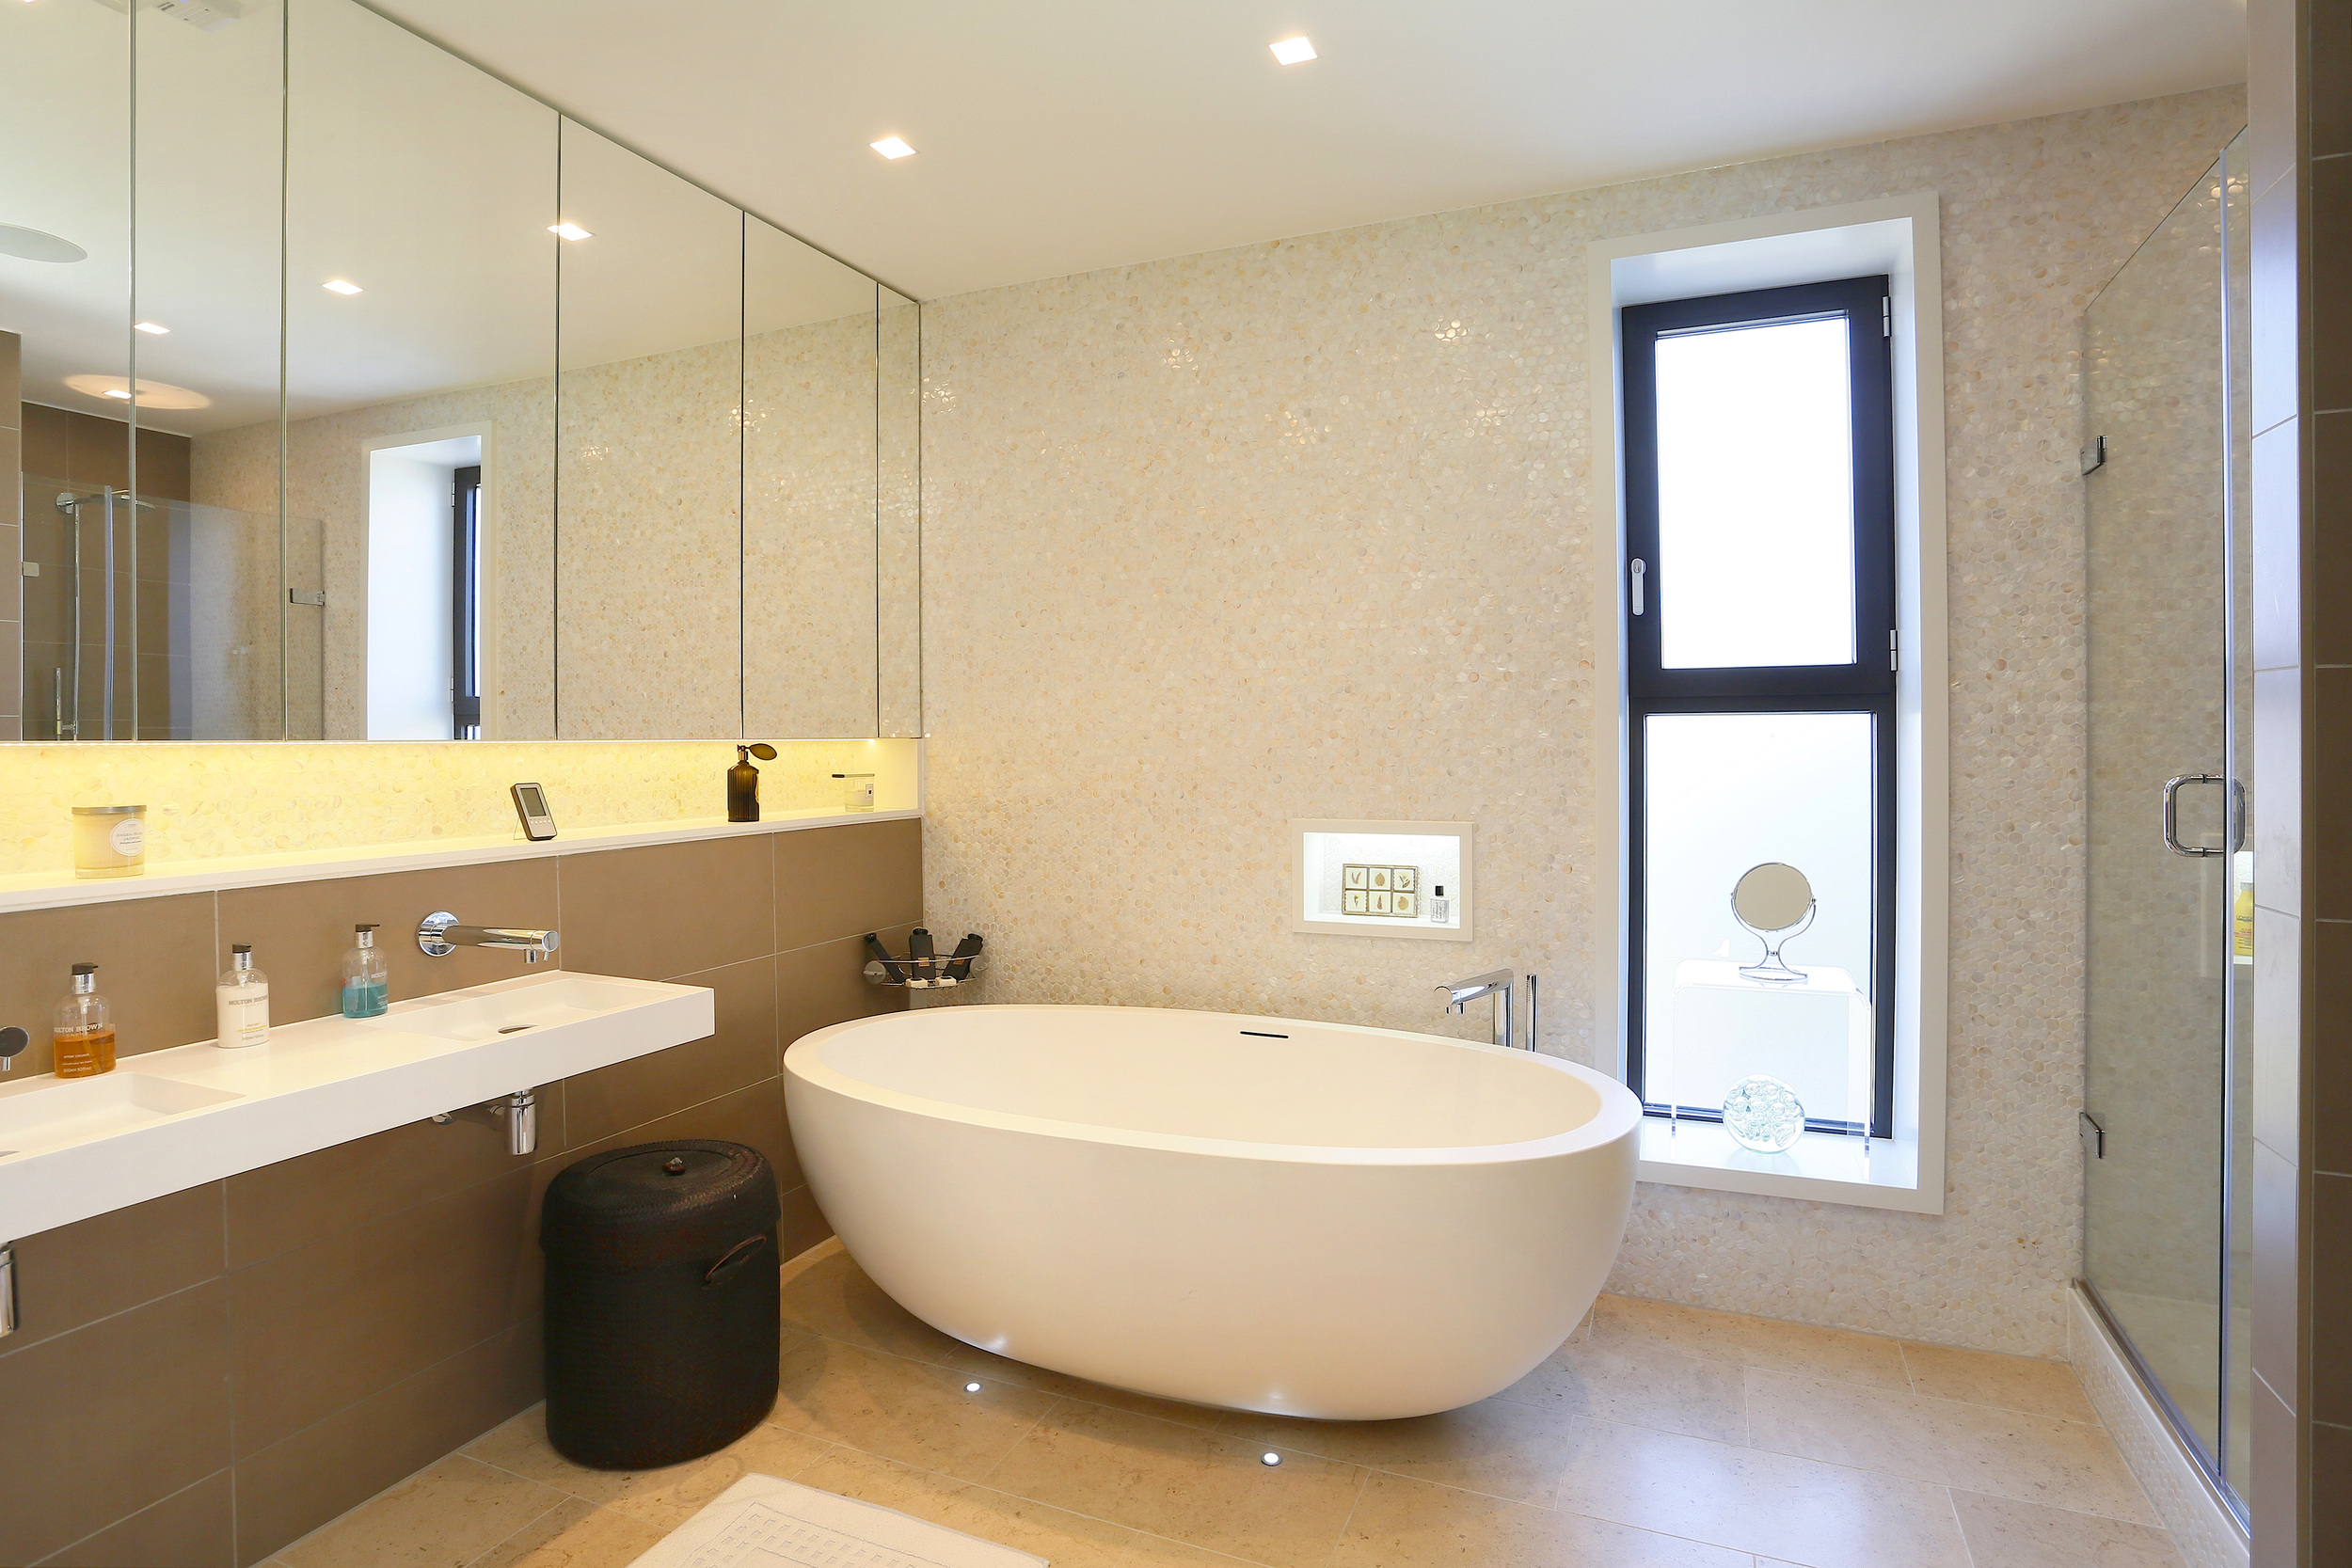 Amoula Hse - Bath.jpg